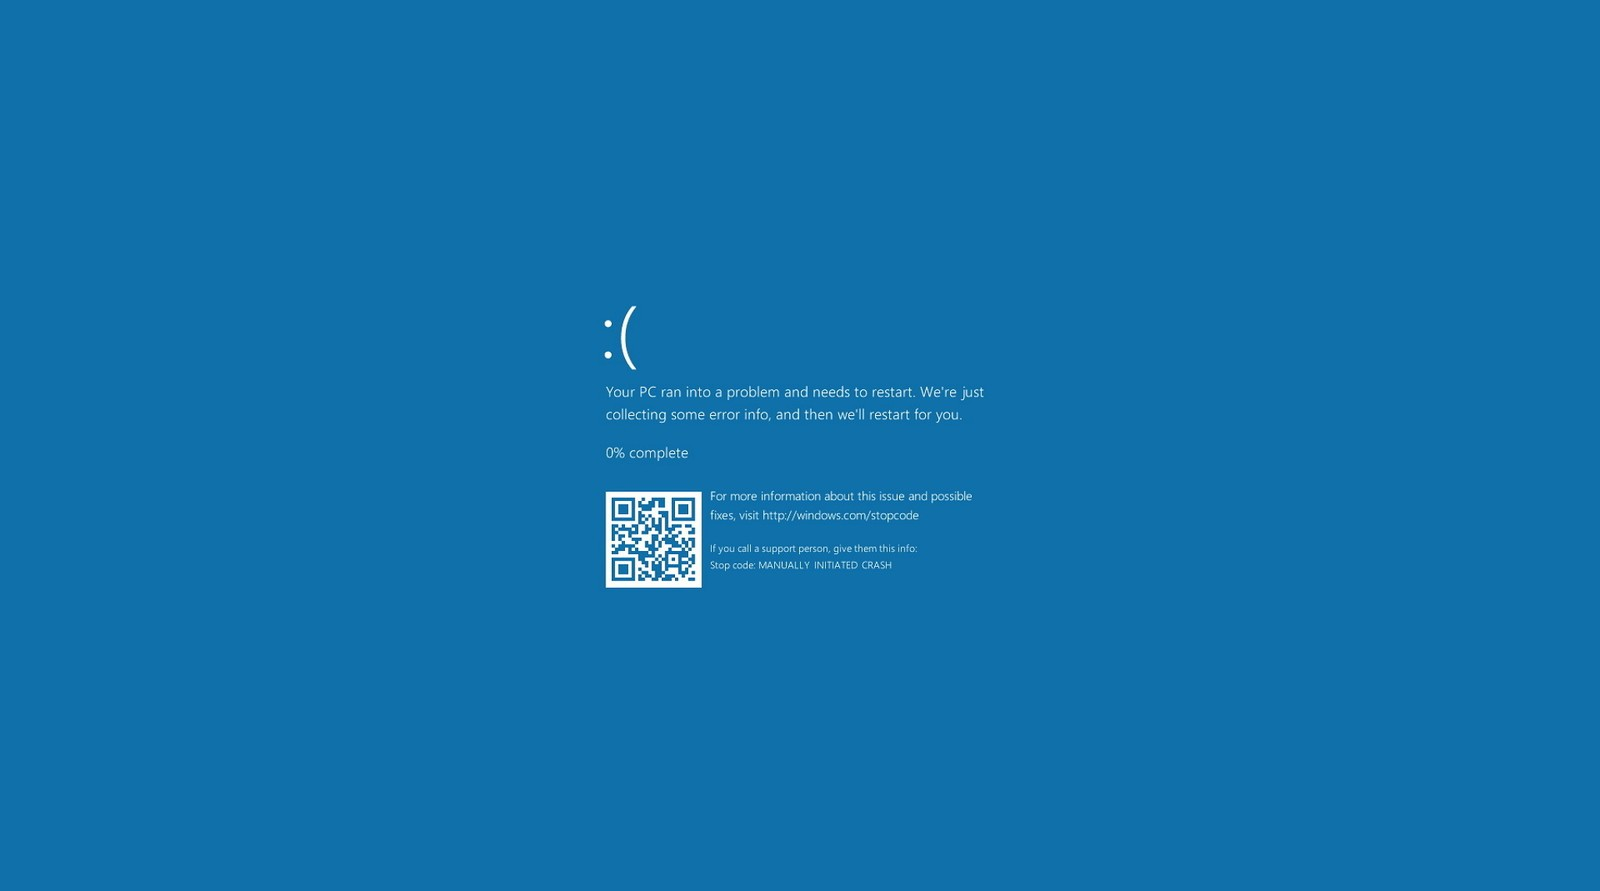 windows-10-blue-screen-death.jpg